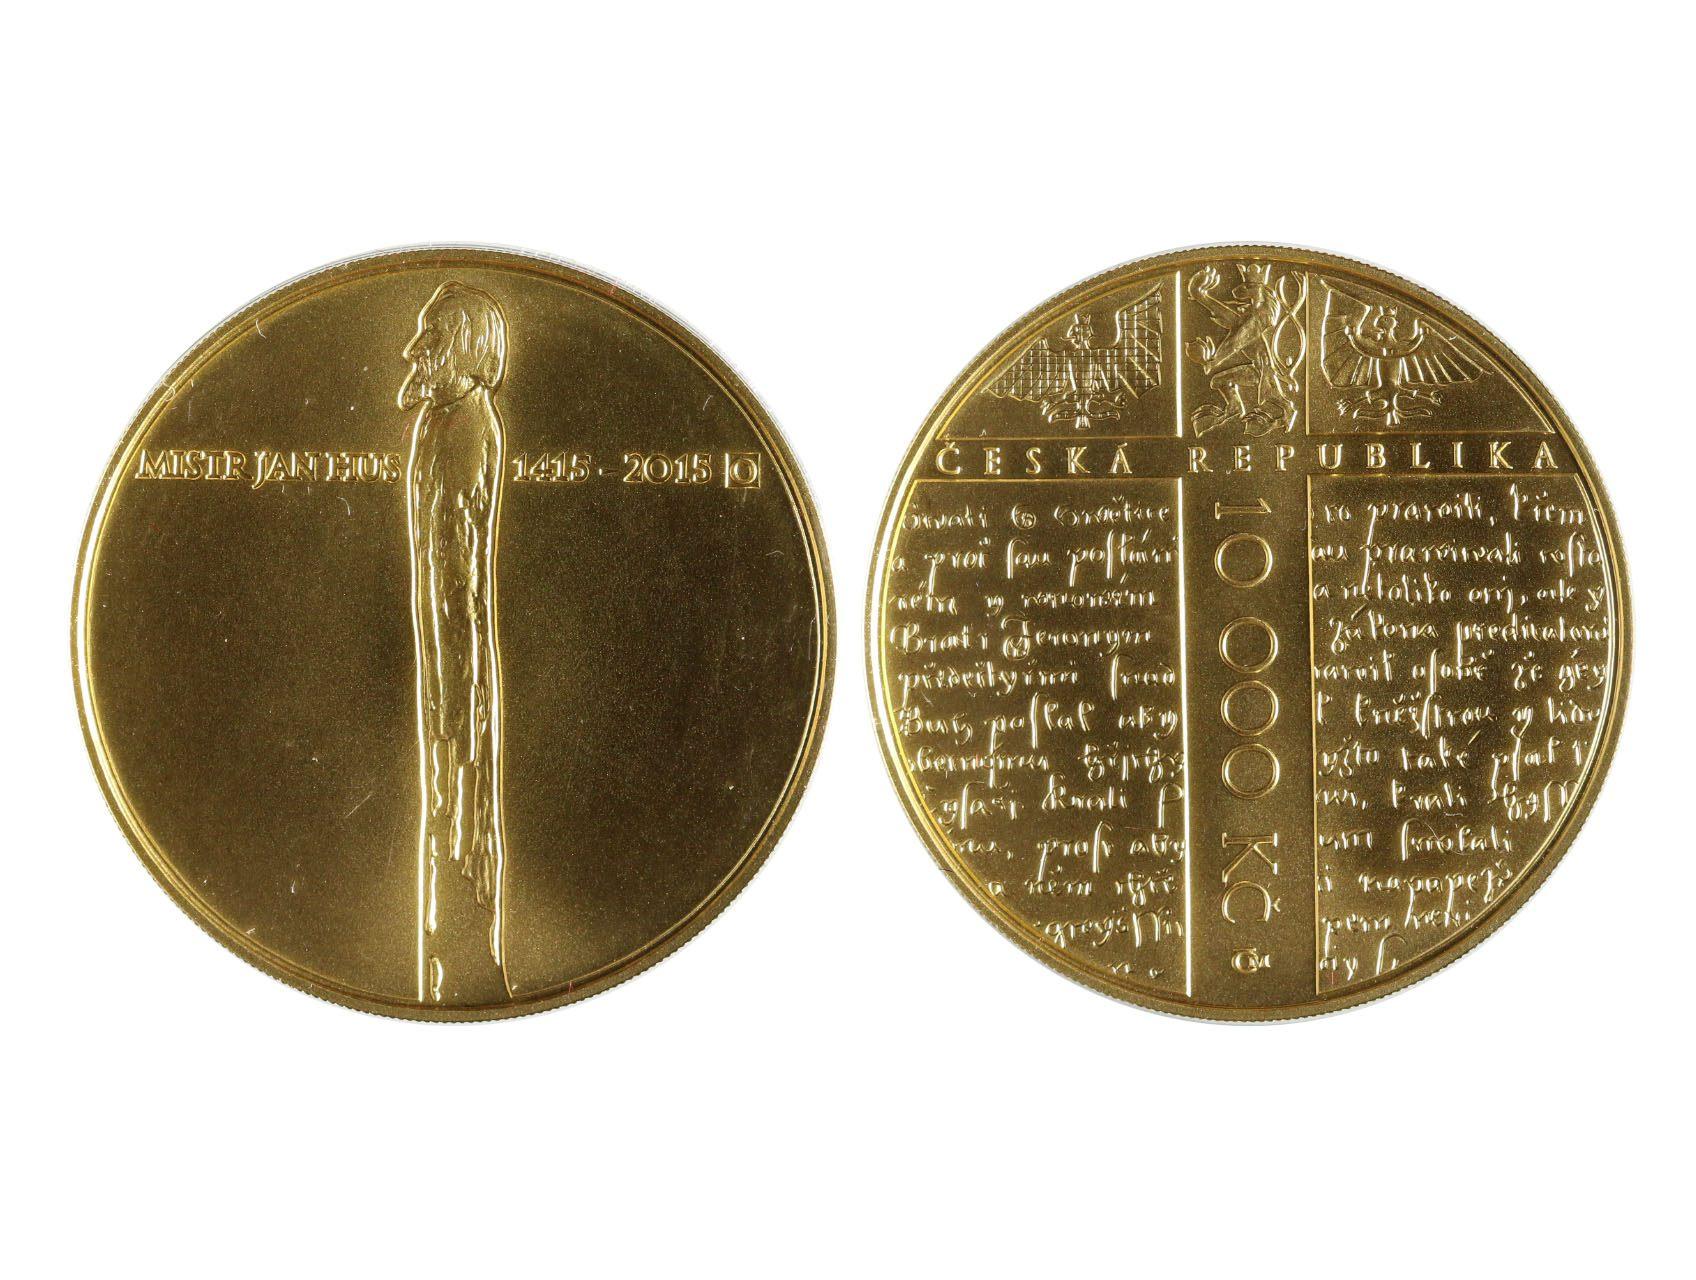 Česká Republika 1993 - 10.000 Kč 2015 Jan Hus, 31,107g, etue, certifikát, bezvadný stav, kvalita b.k., N42